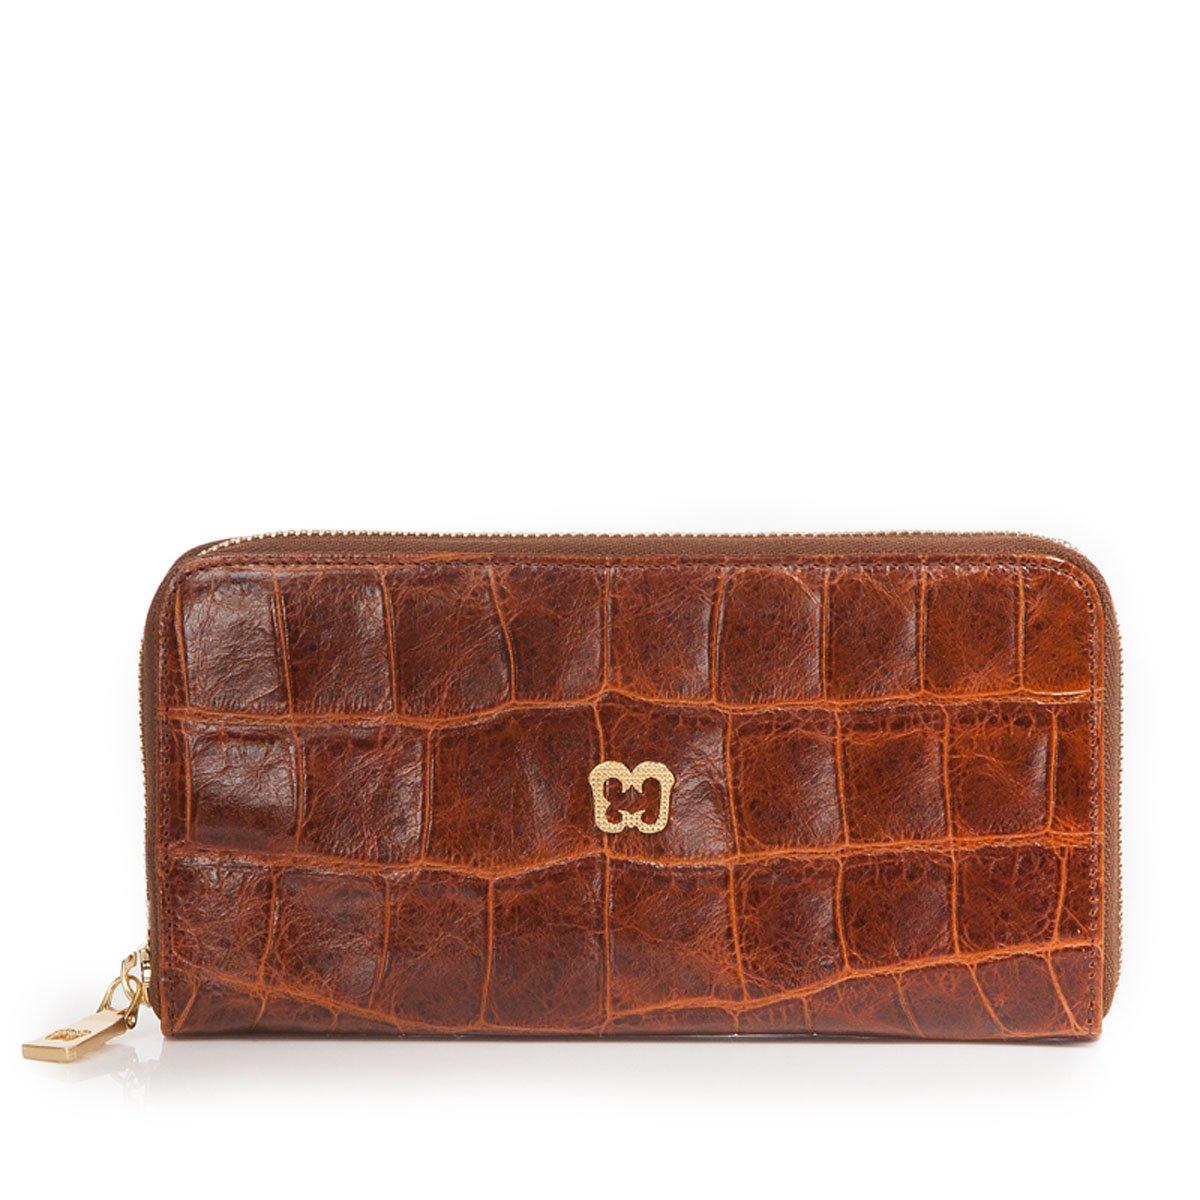 Eric Javits Luxury Fashion Designer Women's Handbag  Zip Wallet  Burnt